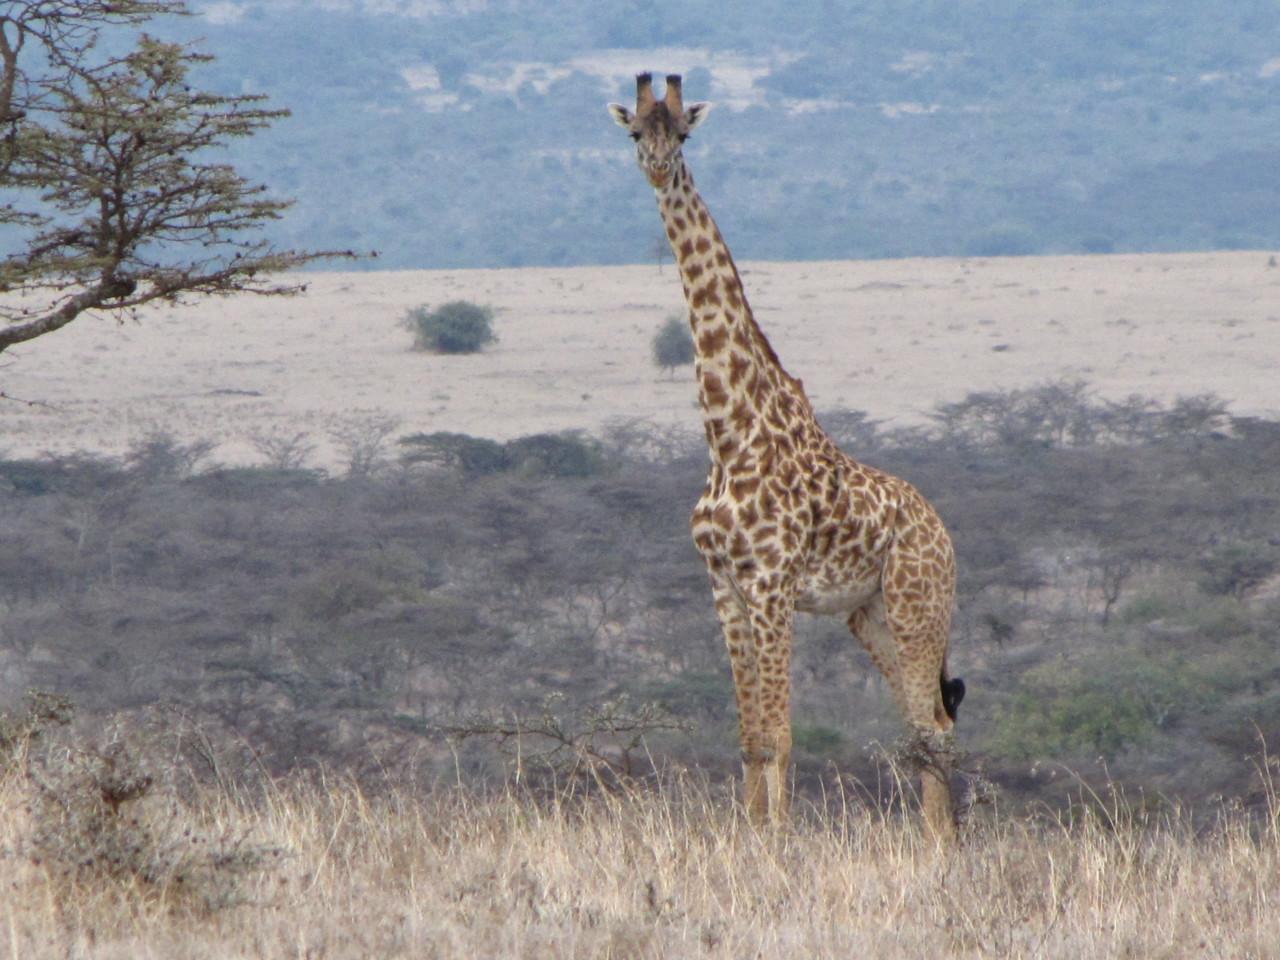 Gorgeous Giraffe in Full View - Wow!